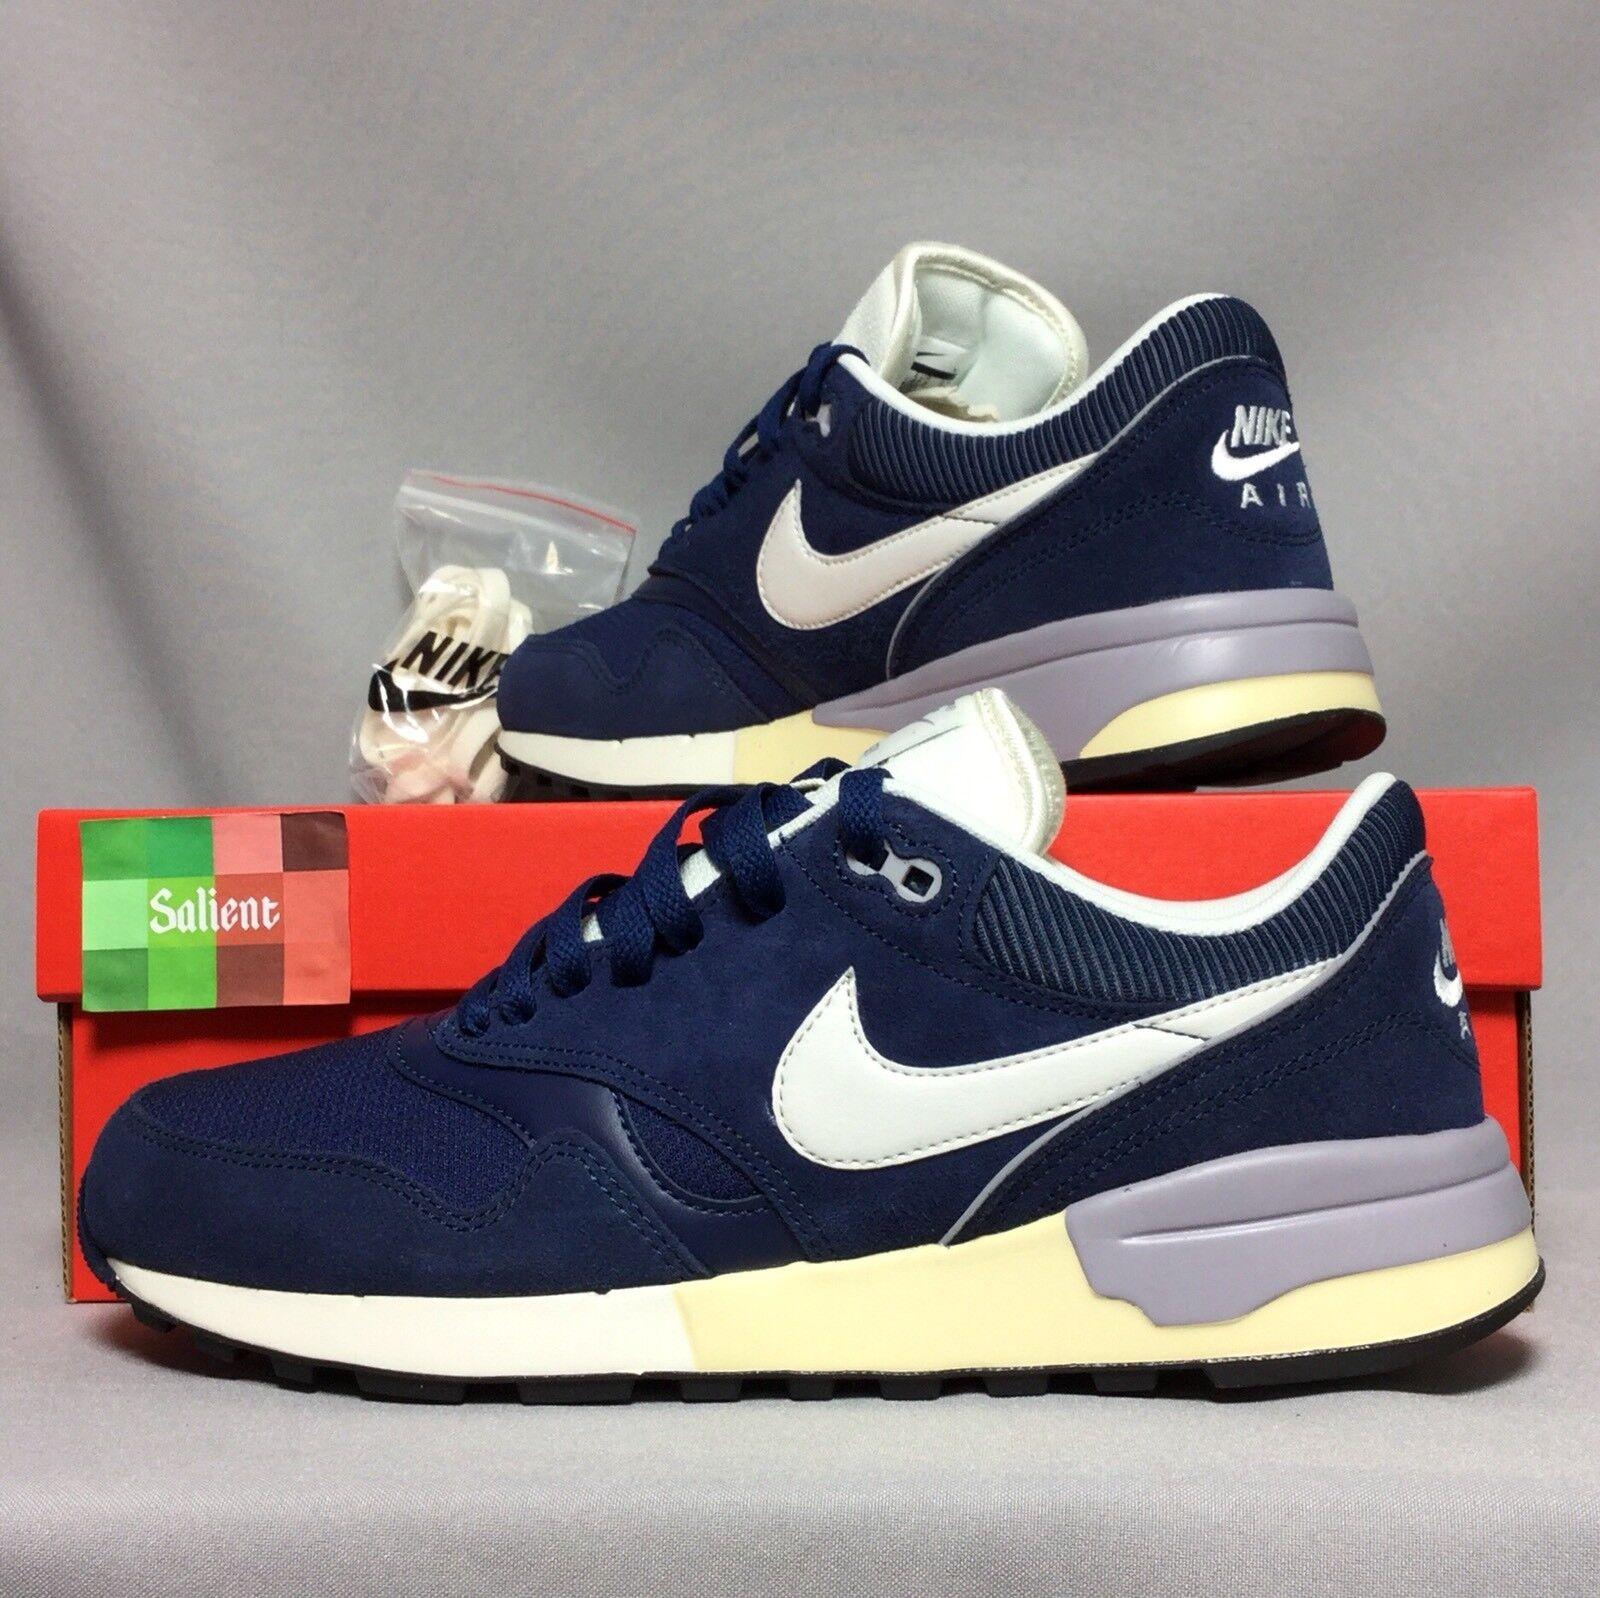 Nike air jordan 12 retrò noi basso uomini scarpe taglia noi retrò 8.5/m scarpe da basket 24fb98